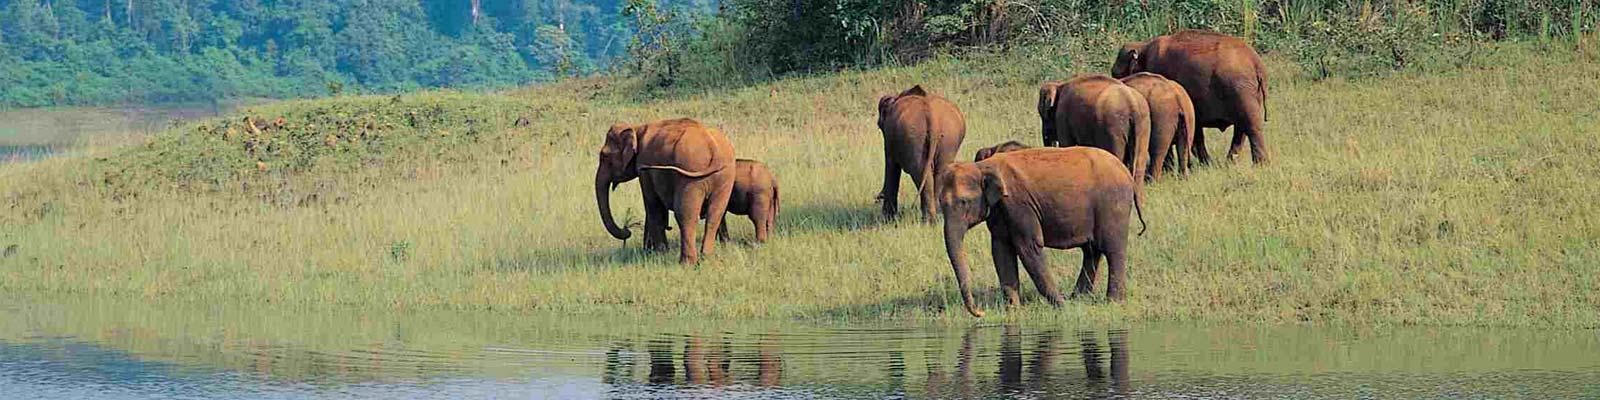 Elephant in priyar national park